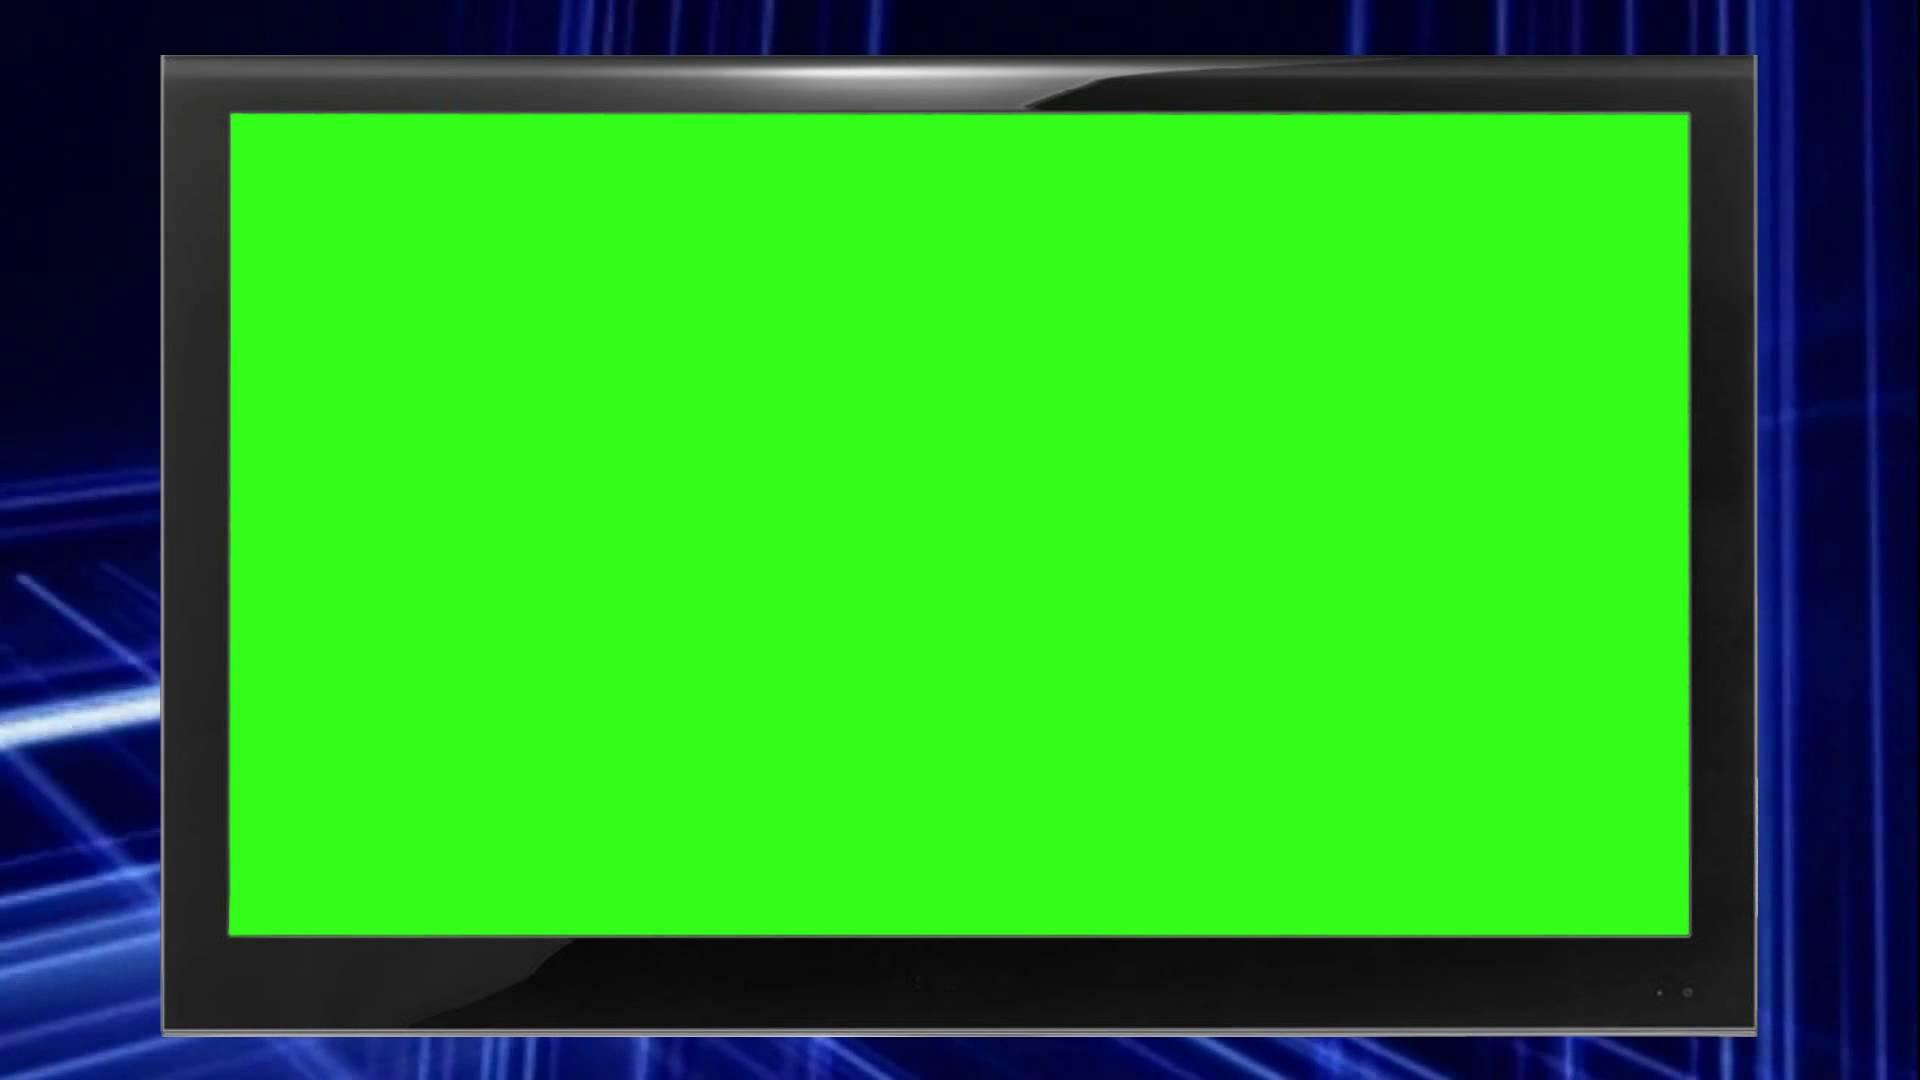 Tv Screen Wall 1920x1080